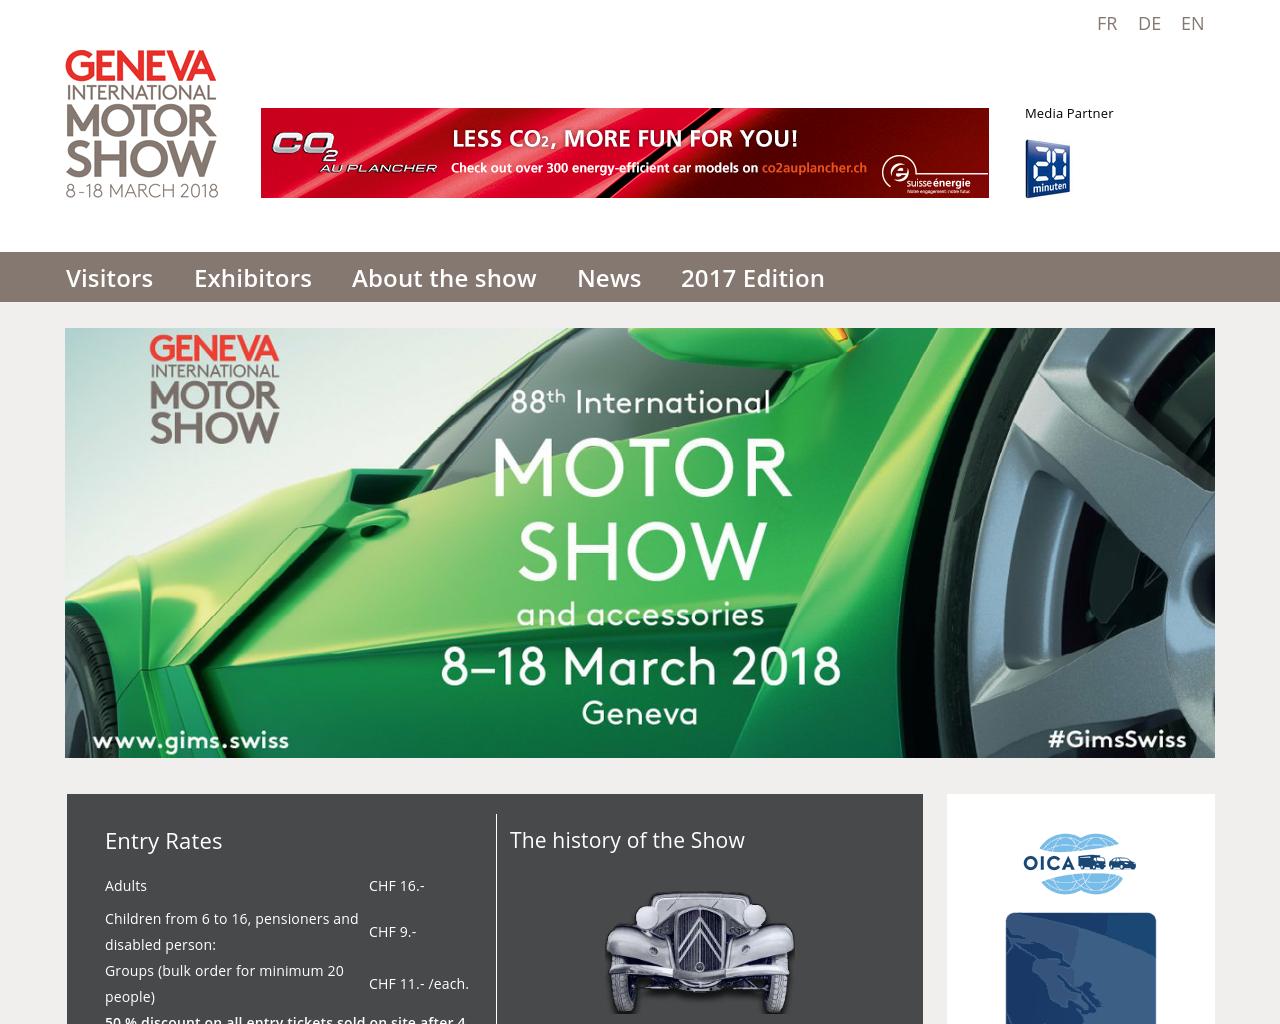 Geneva-International-Motor-Show-Advertising-Reviews-Pricing